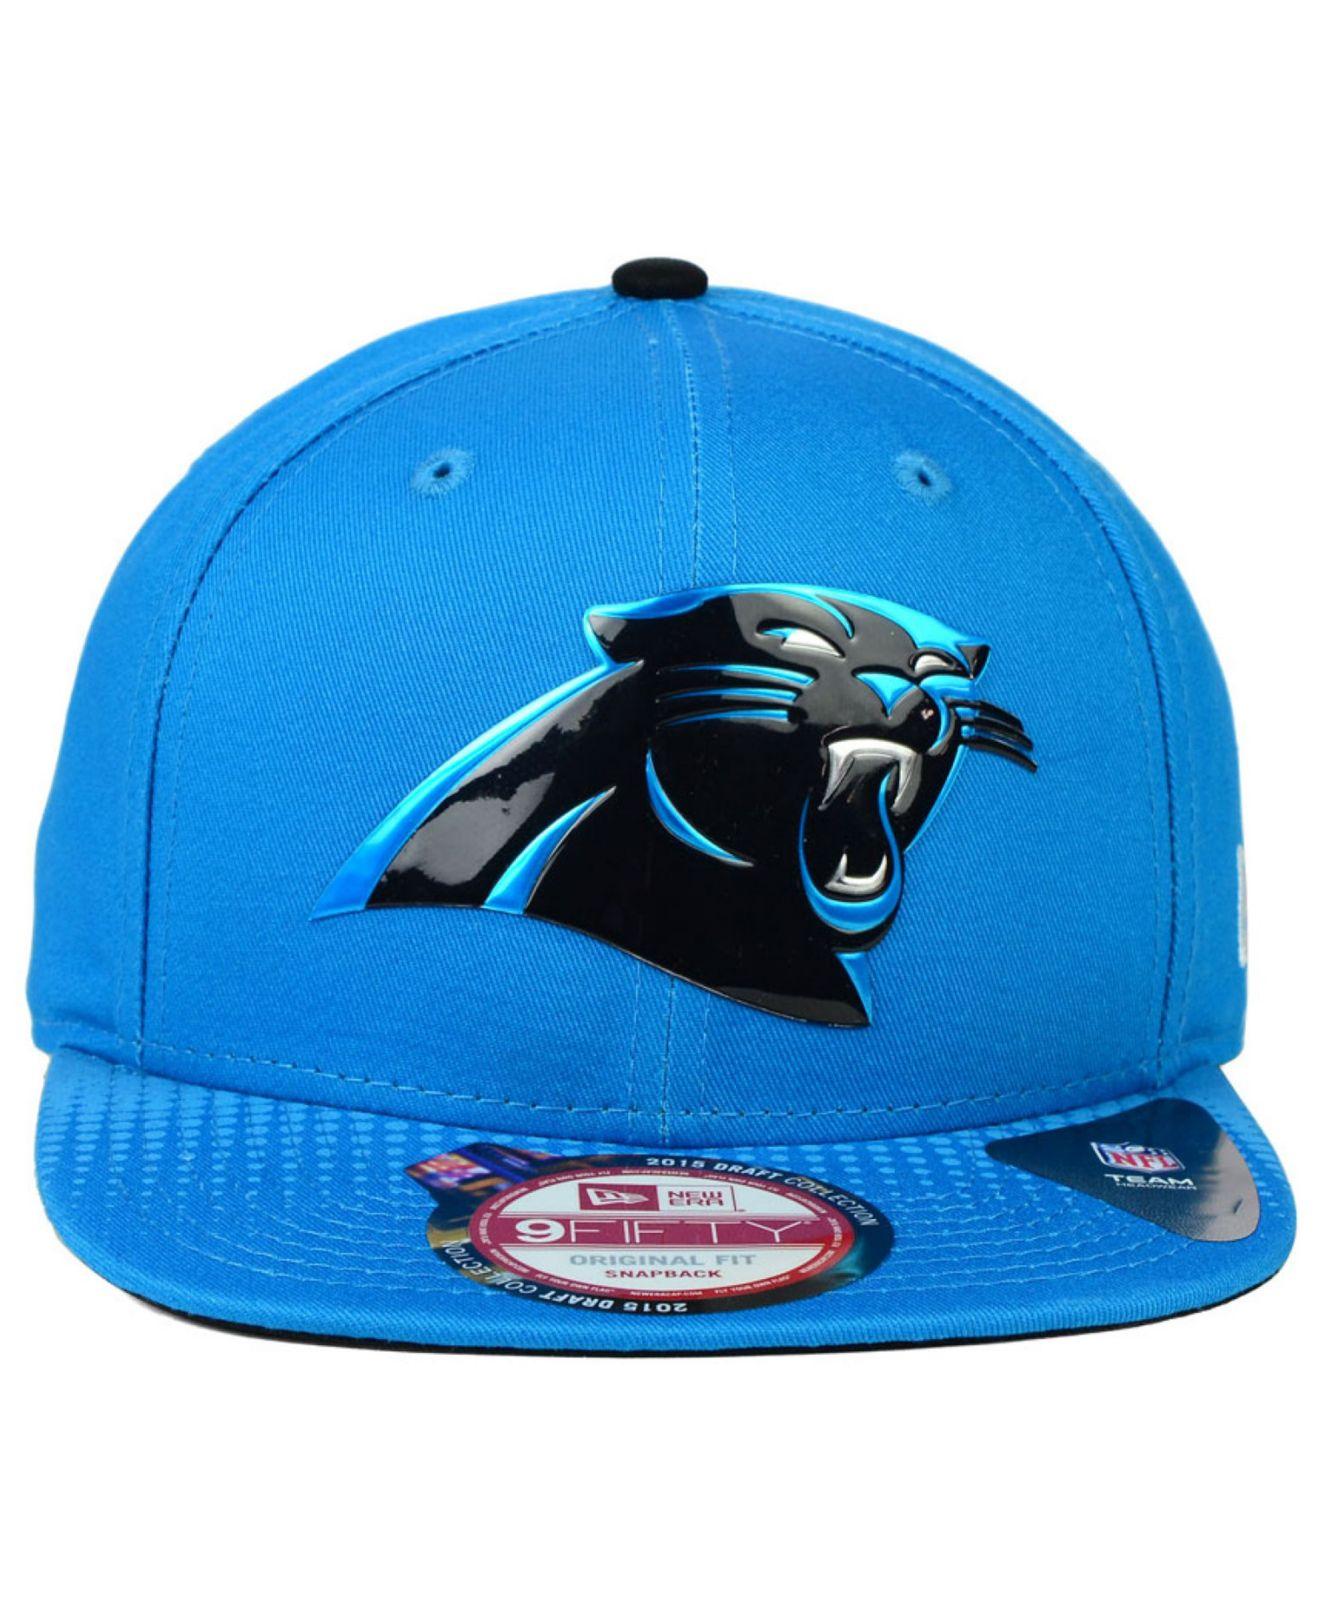 Lyst - KTZ Carolina Panthers 2015 Nfl Draft 9fifty Snapback Cap in ... ed30ebe2a31